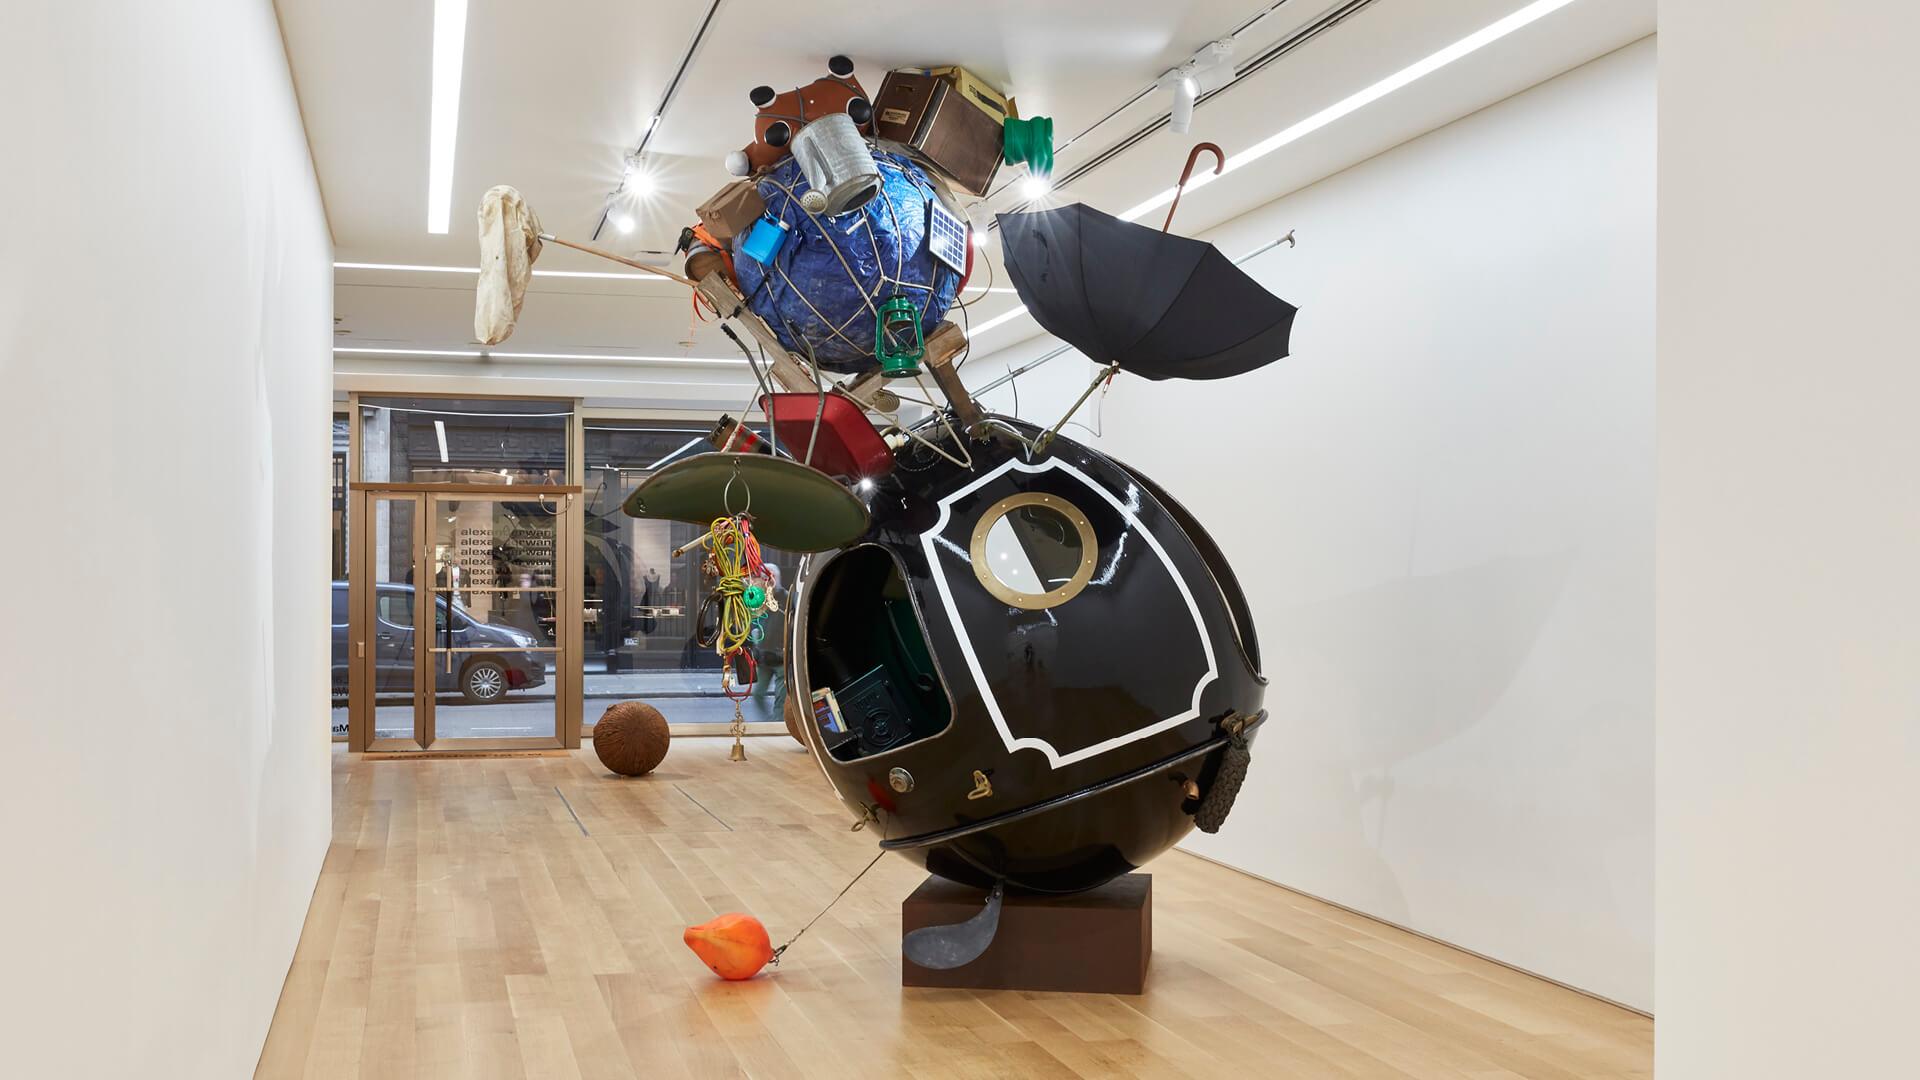 Houseboatball, 2020. Installation View, Lars Fisk: Wattle & Daub, Marlborough, London | Wattle & Daub | Lars Fisk | STIRworld